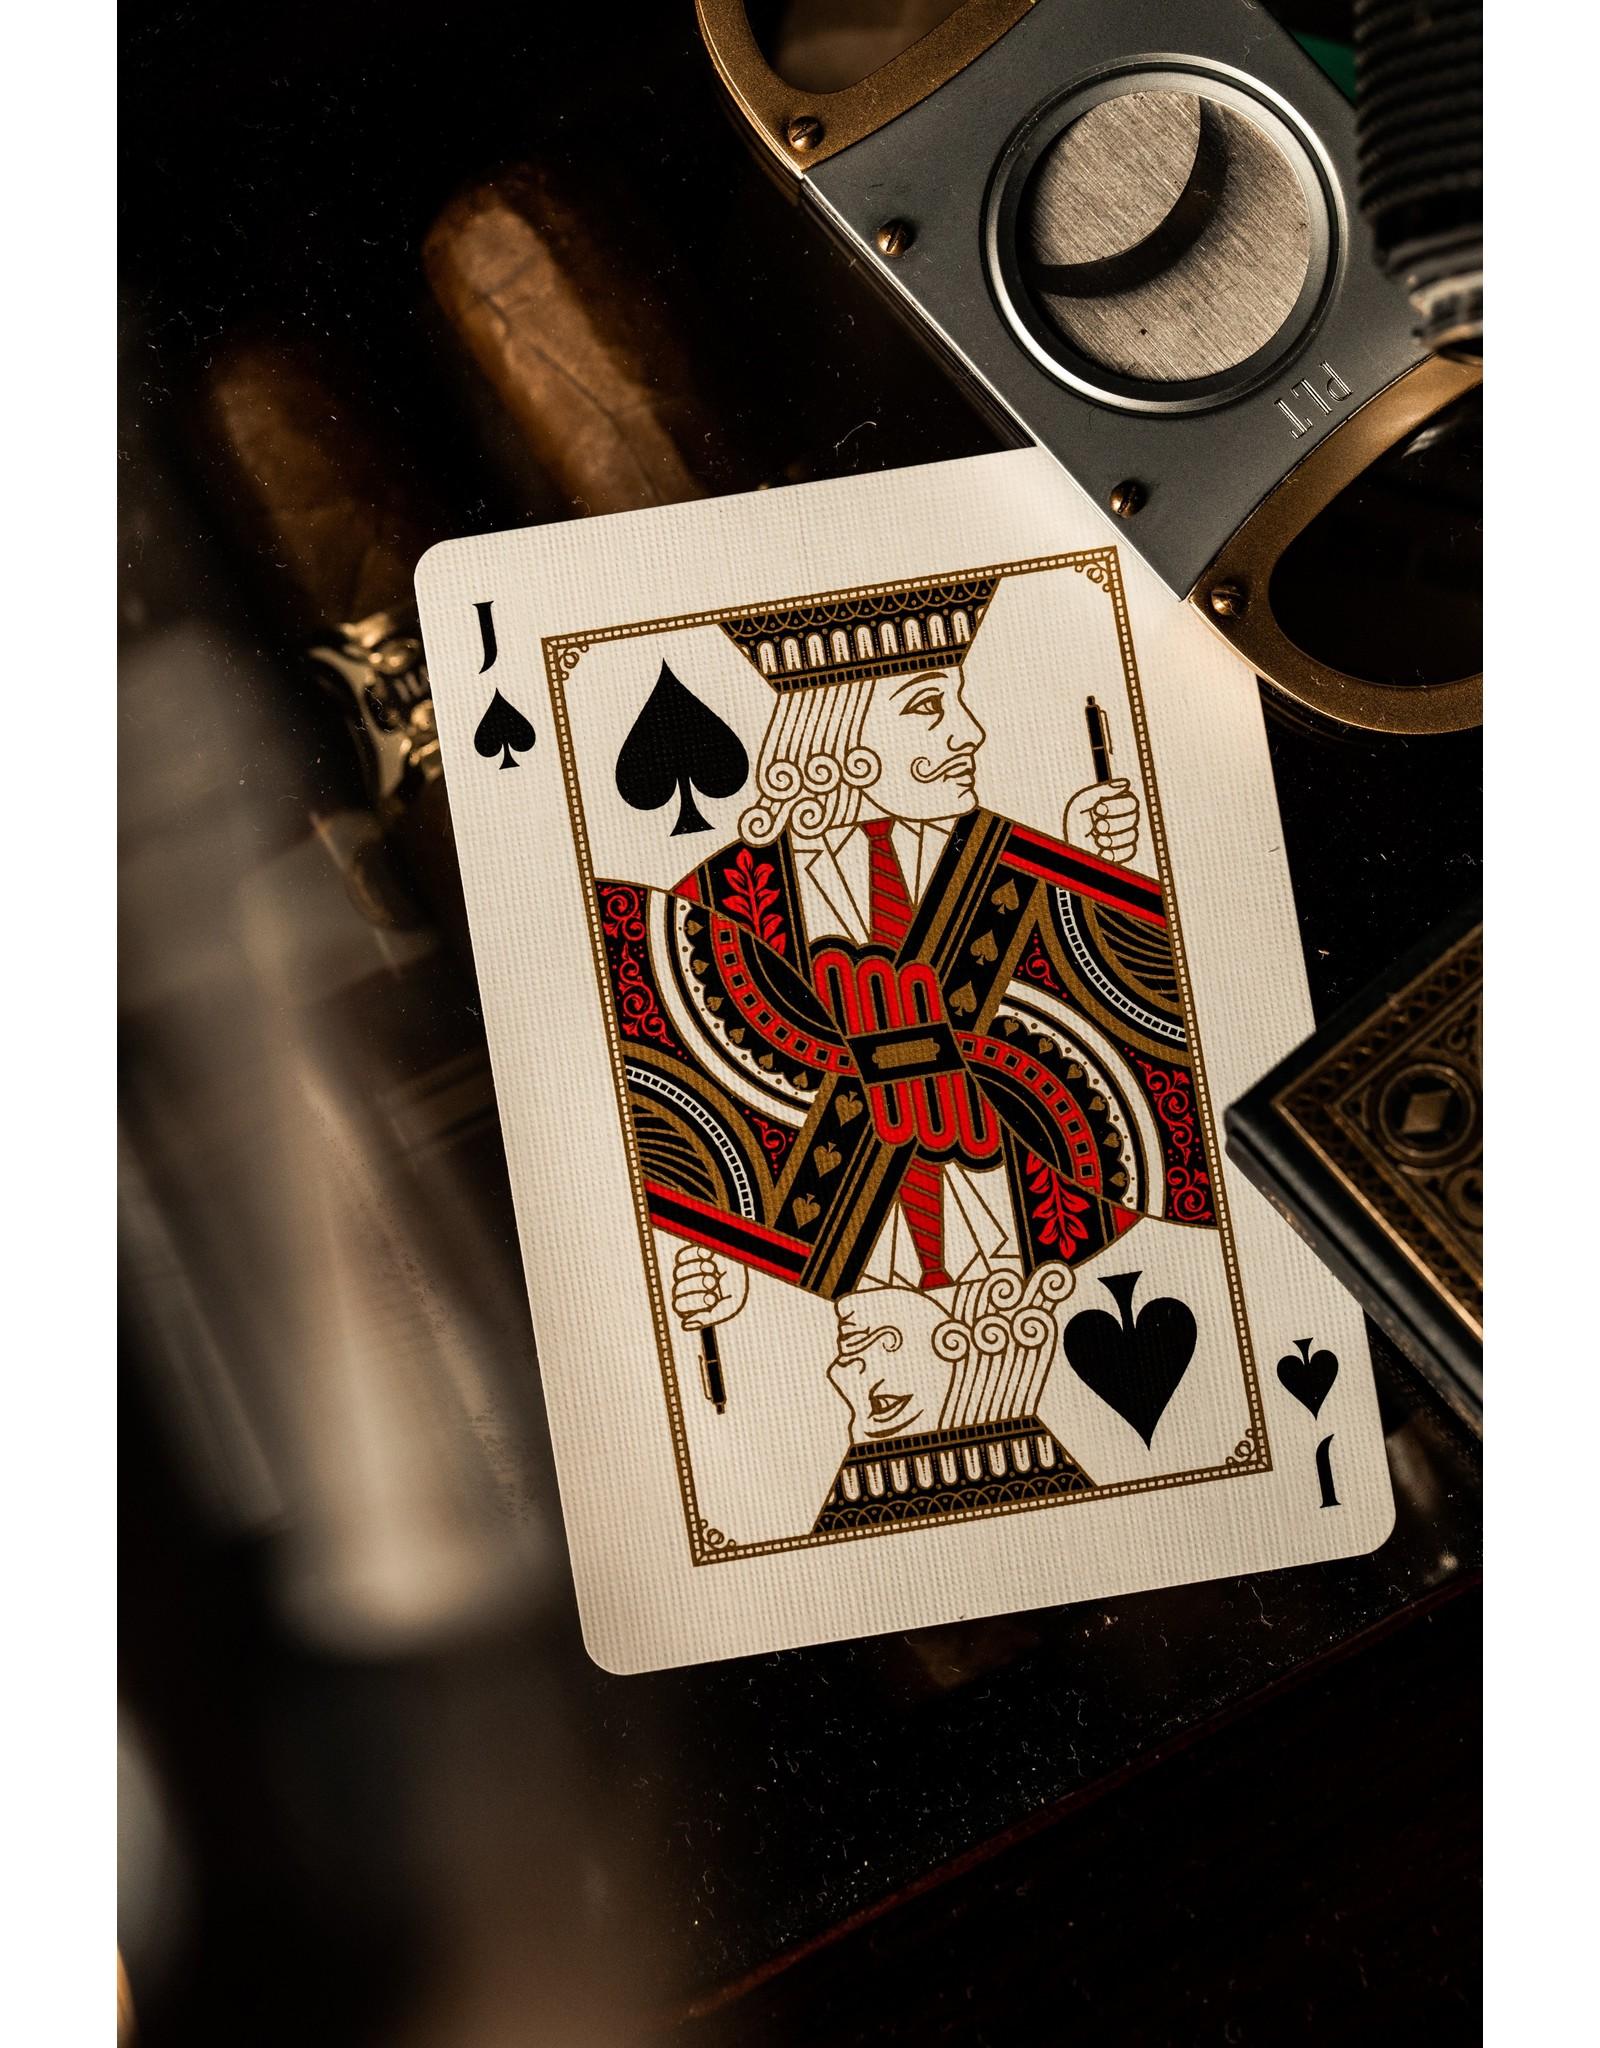 US Playing Card Co. Bicycle Theory 11 (SW/Bond/Avg/Mando)